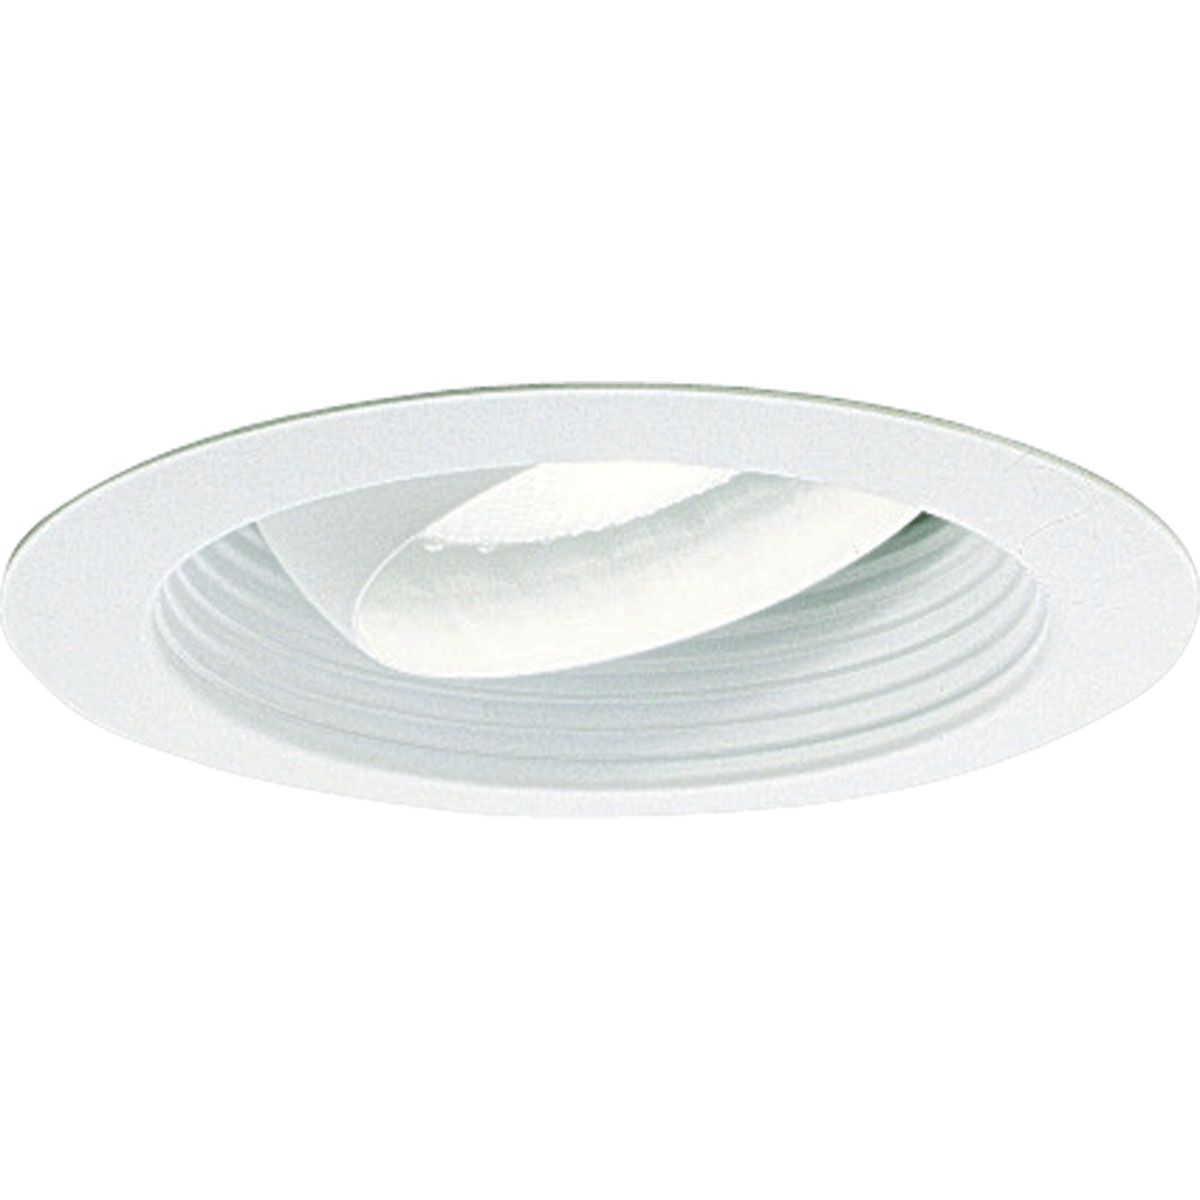 PROP8079-28 REGRESSED EYEBALL; BRIGHT WHITE; 6 INCH NOMINAL APERTURE SIZE; ROUND APERTURE SHAPE; PAR30 75/85 W, BR30 65 W INCANDESCENT LAMP; BR30 85 W, PAR30 75 W FLUORESCENT LAMP; INSULATED/NON INSULATED CEILING; SIZE 7 3/4 INCH DIA; PROGRESS LIGHTING[R] BRAND, PROGRESS